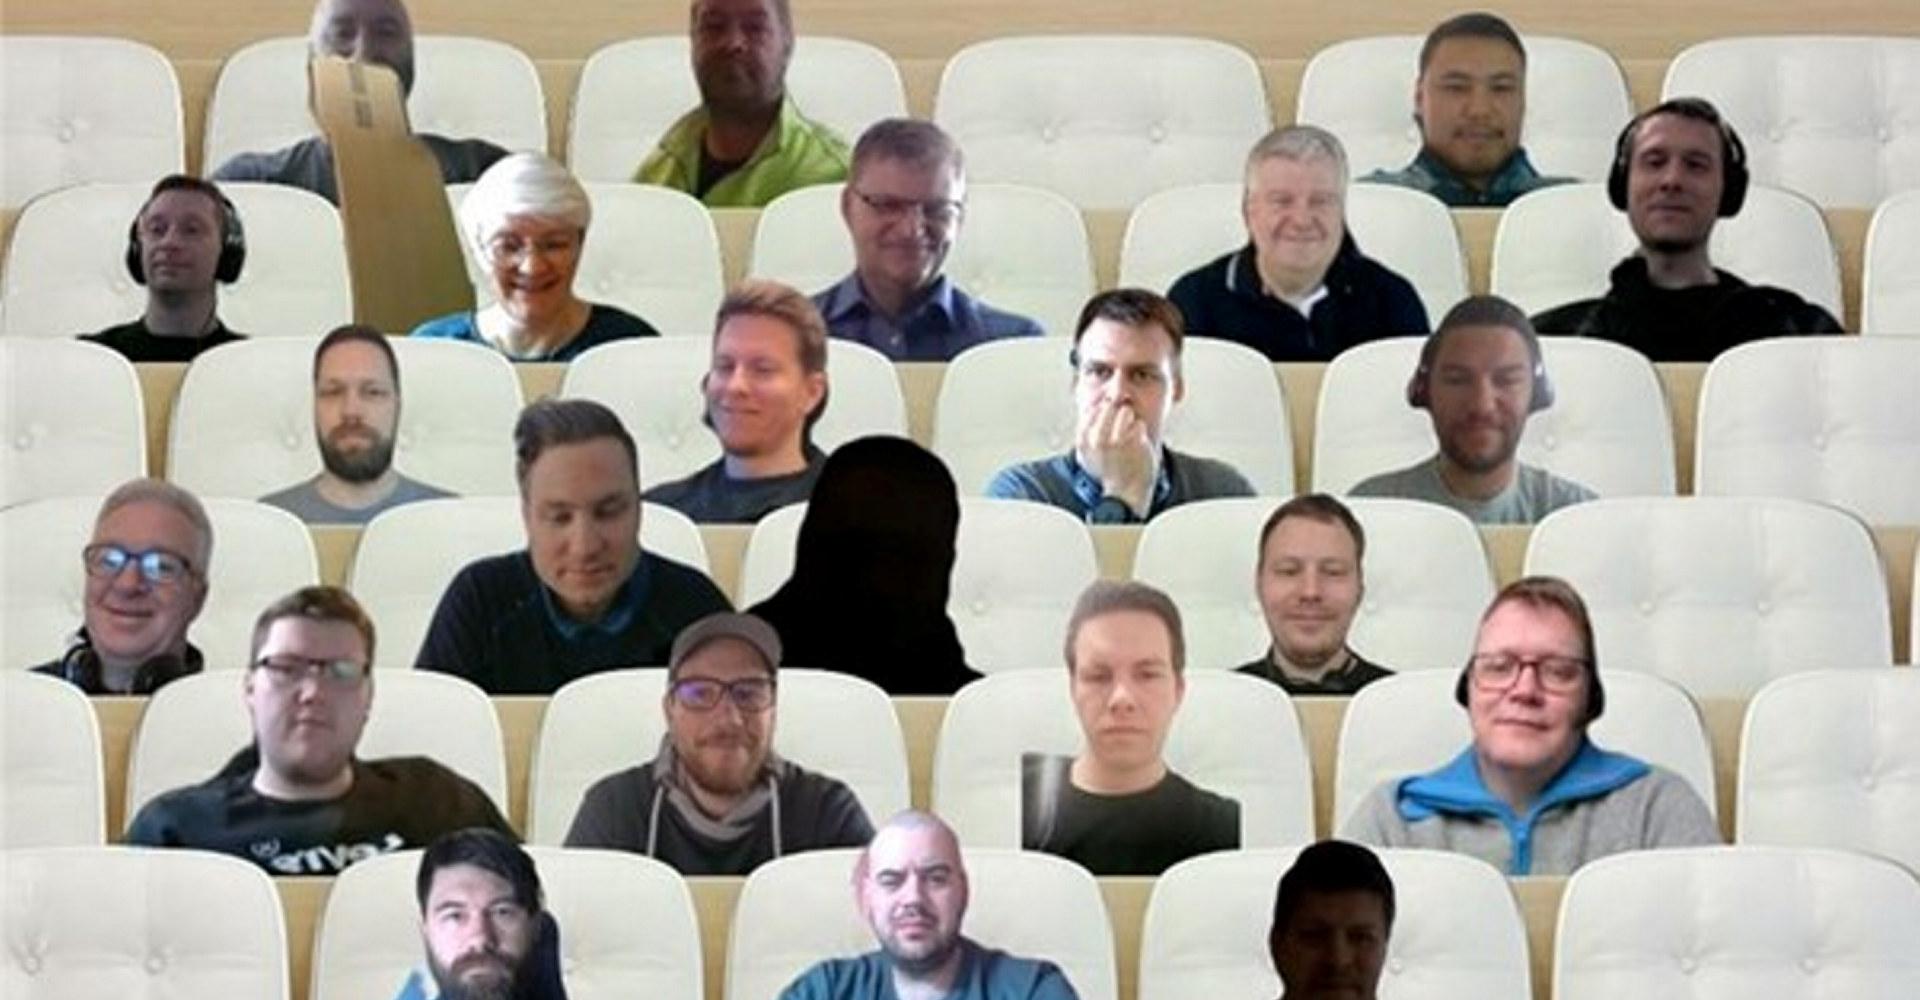 Studenter på kurset «Lean i Industri 4.0» i regi av Fagskolen Innlandet. Skjermdump fra Teams-samlingen